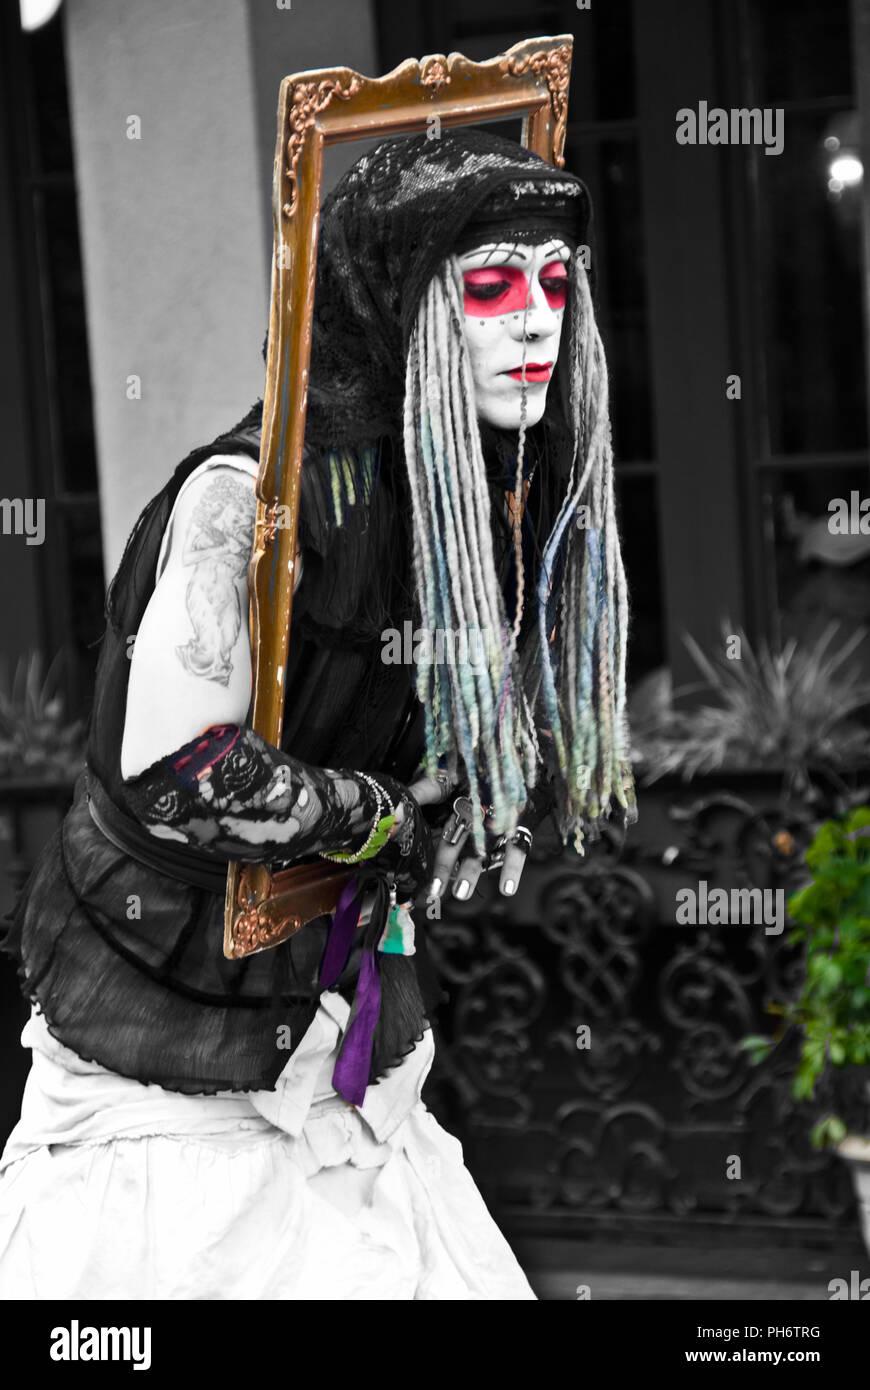 French Quarter Street Mime Artist - Stock Image